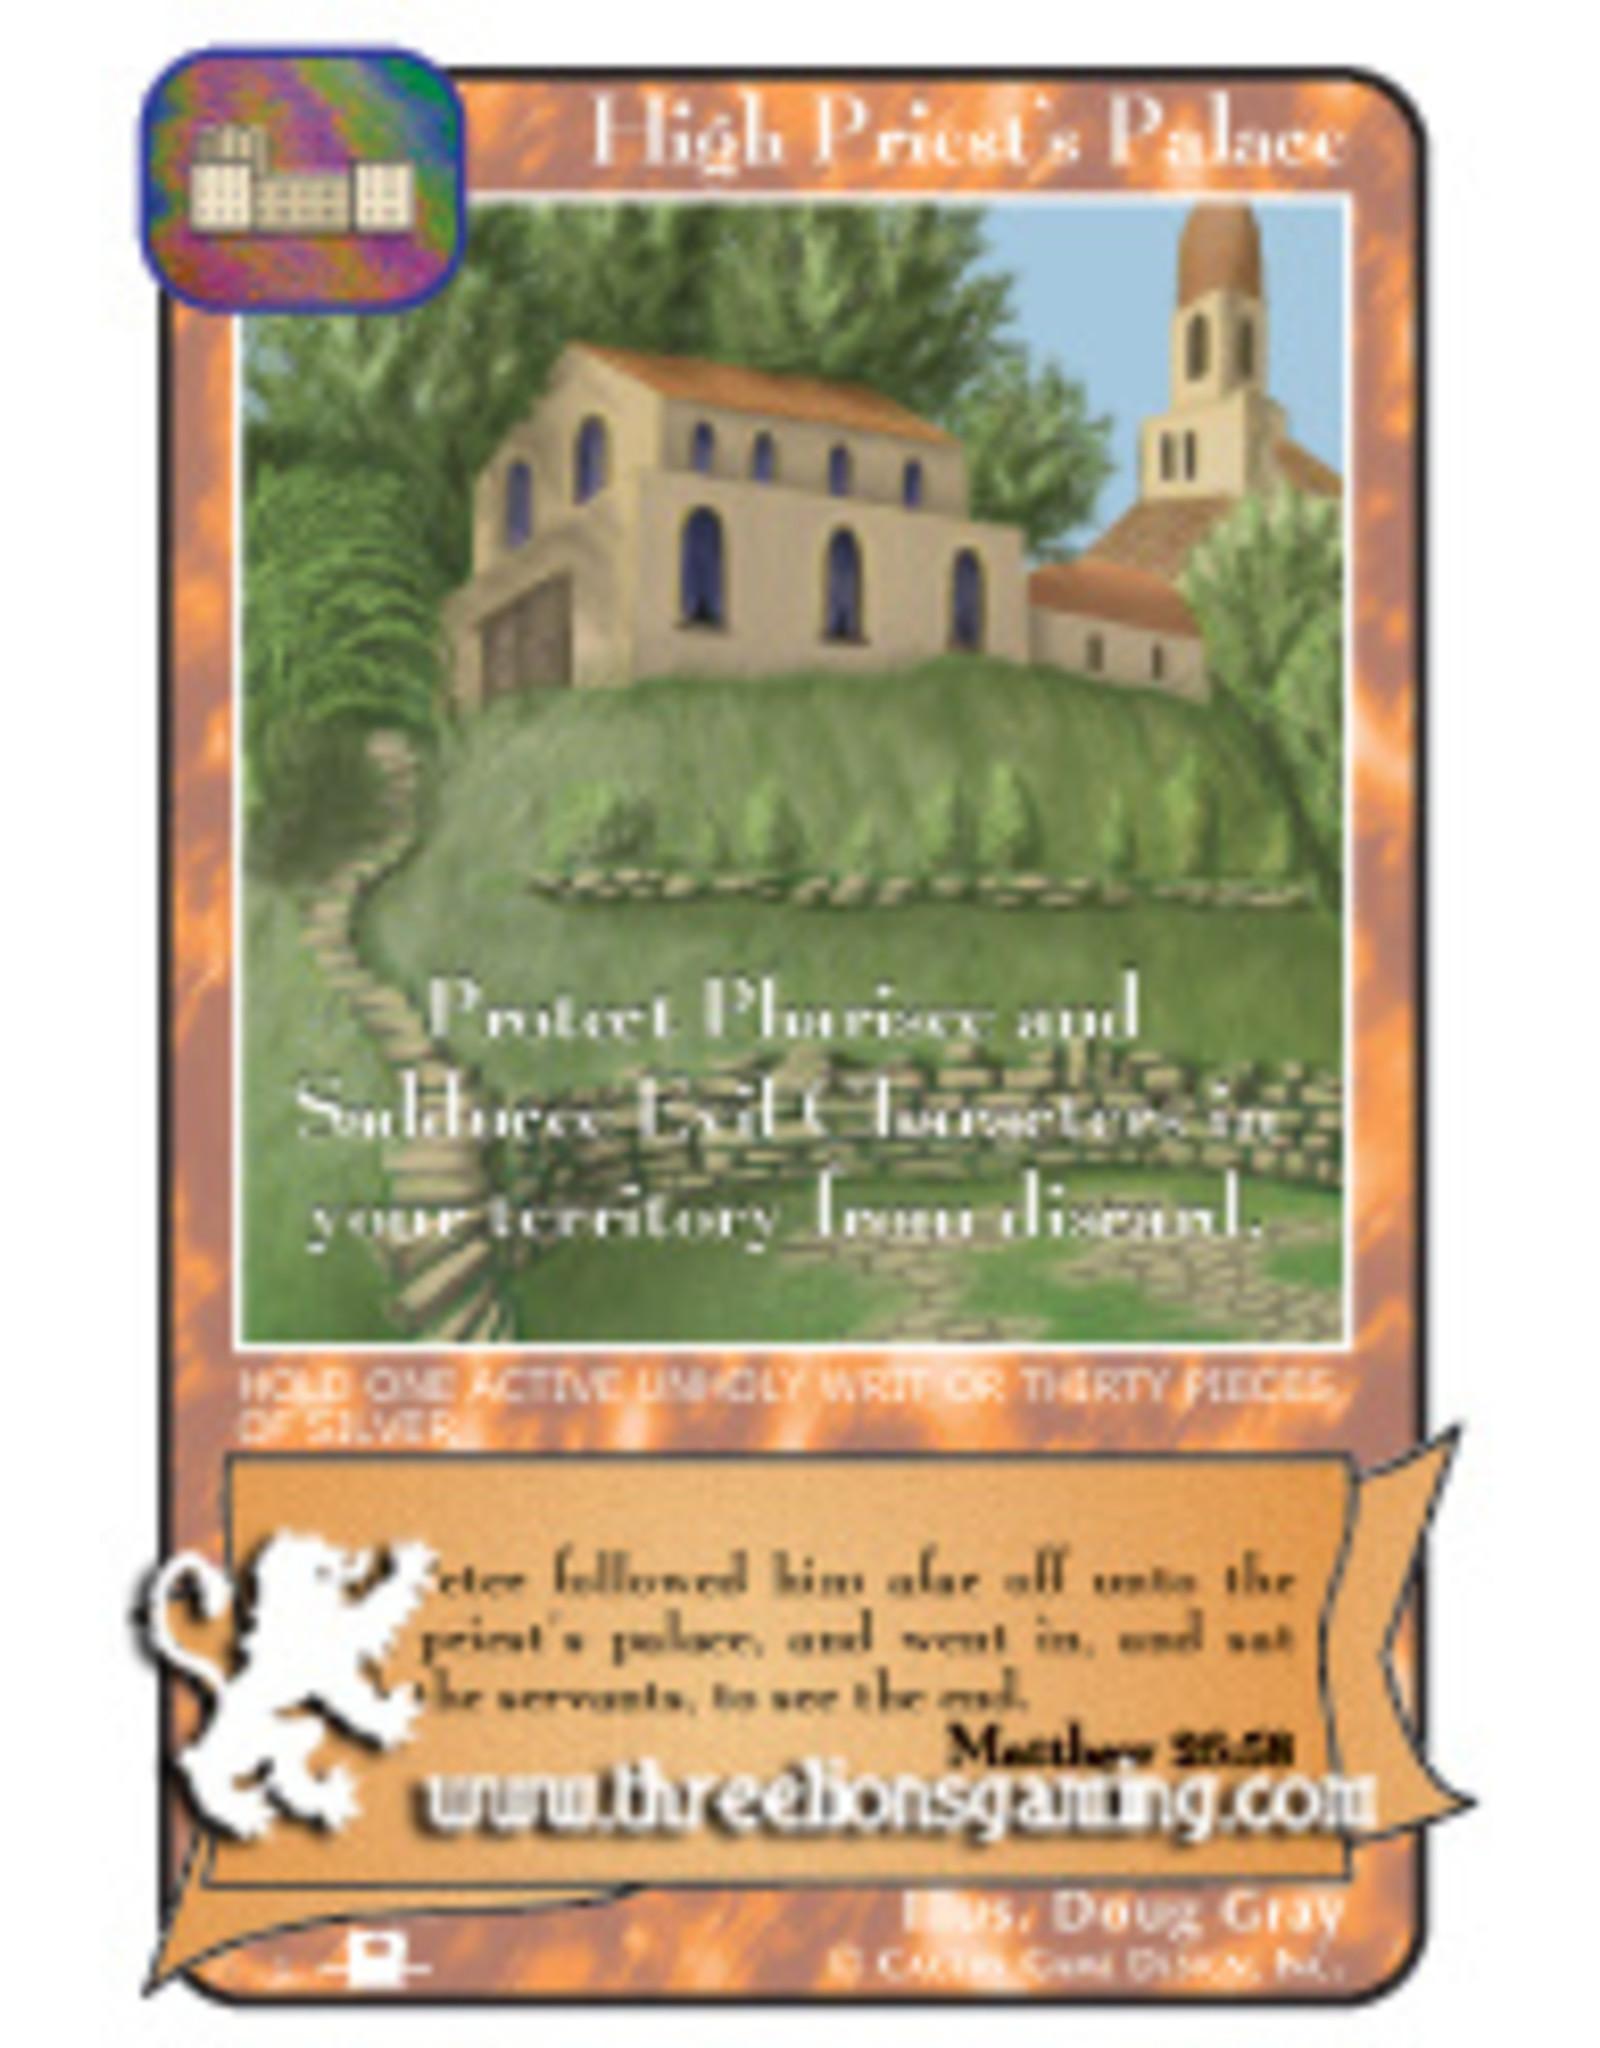 Priests: High Priest's Palace